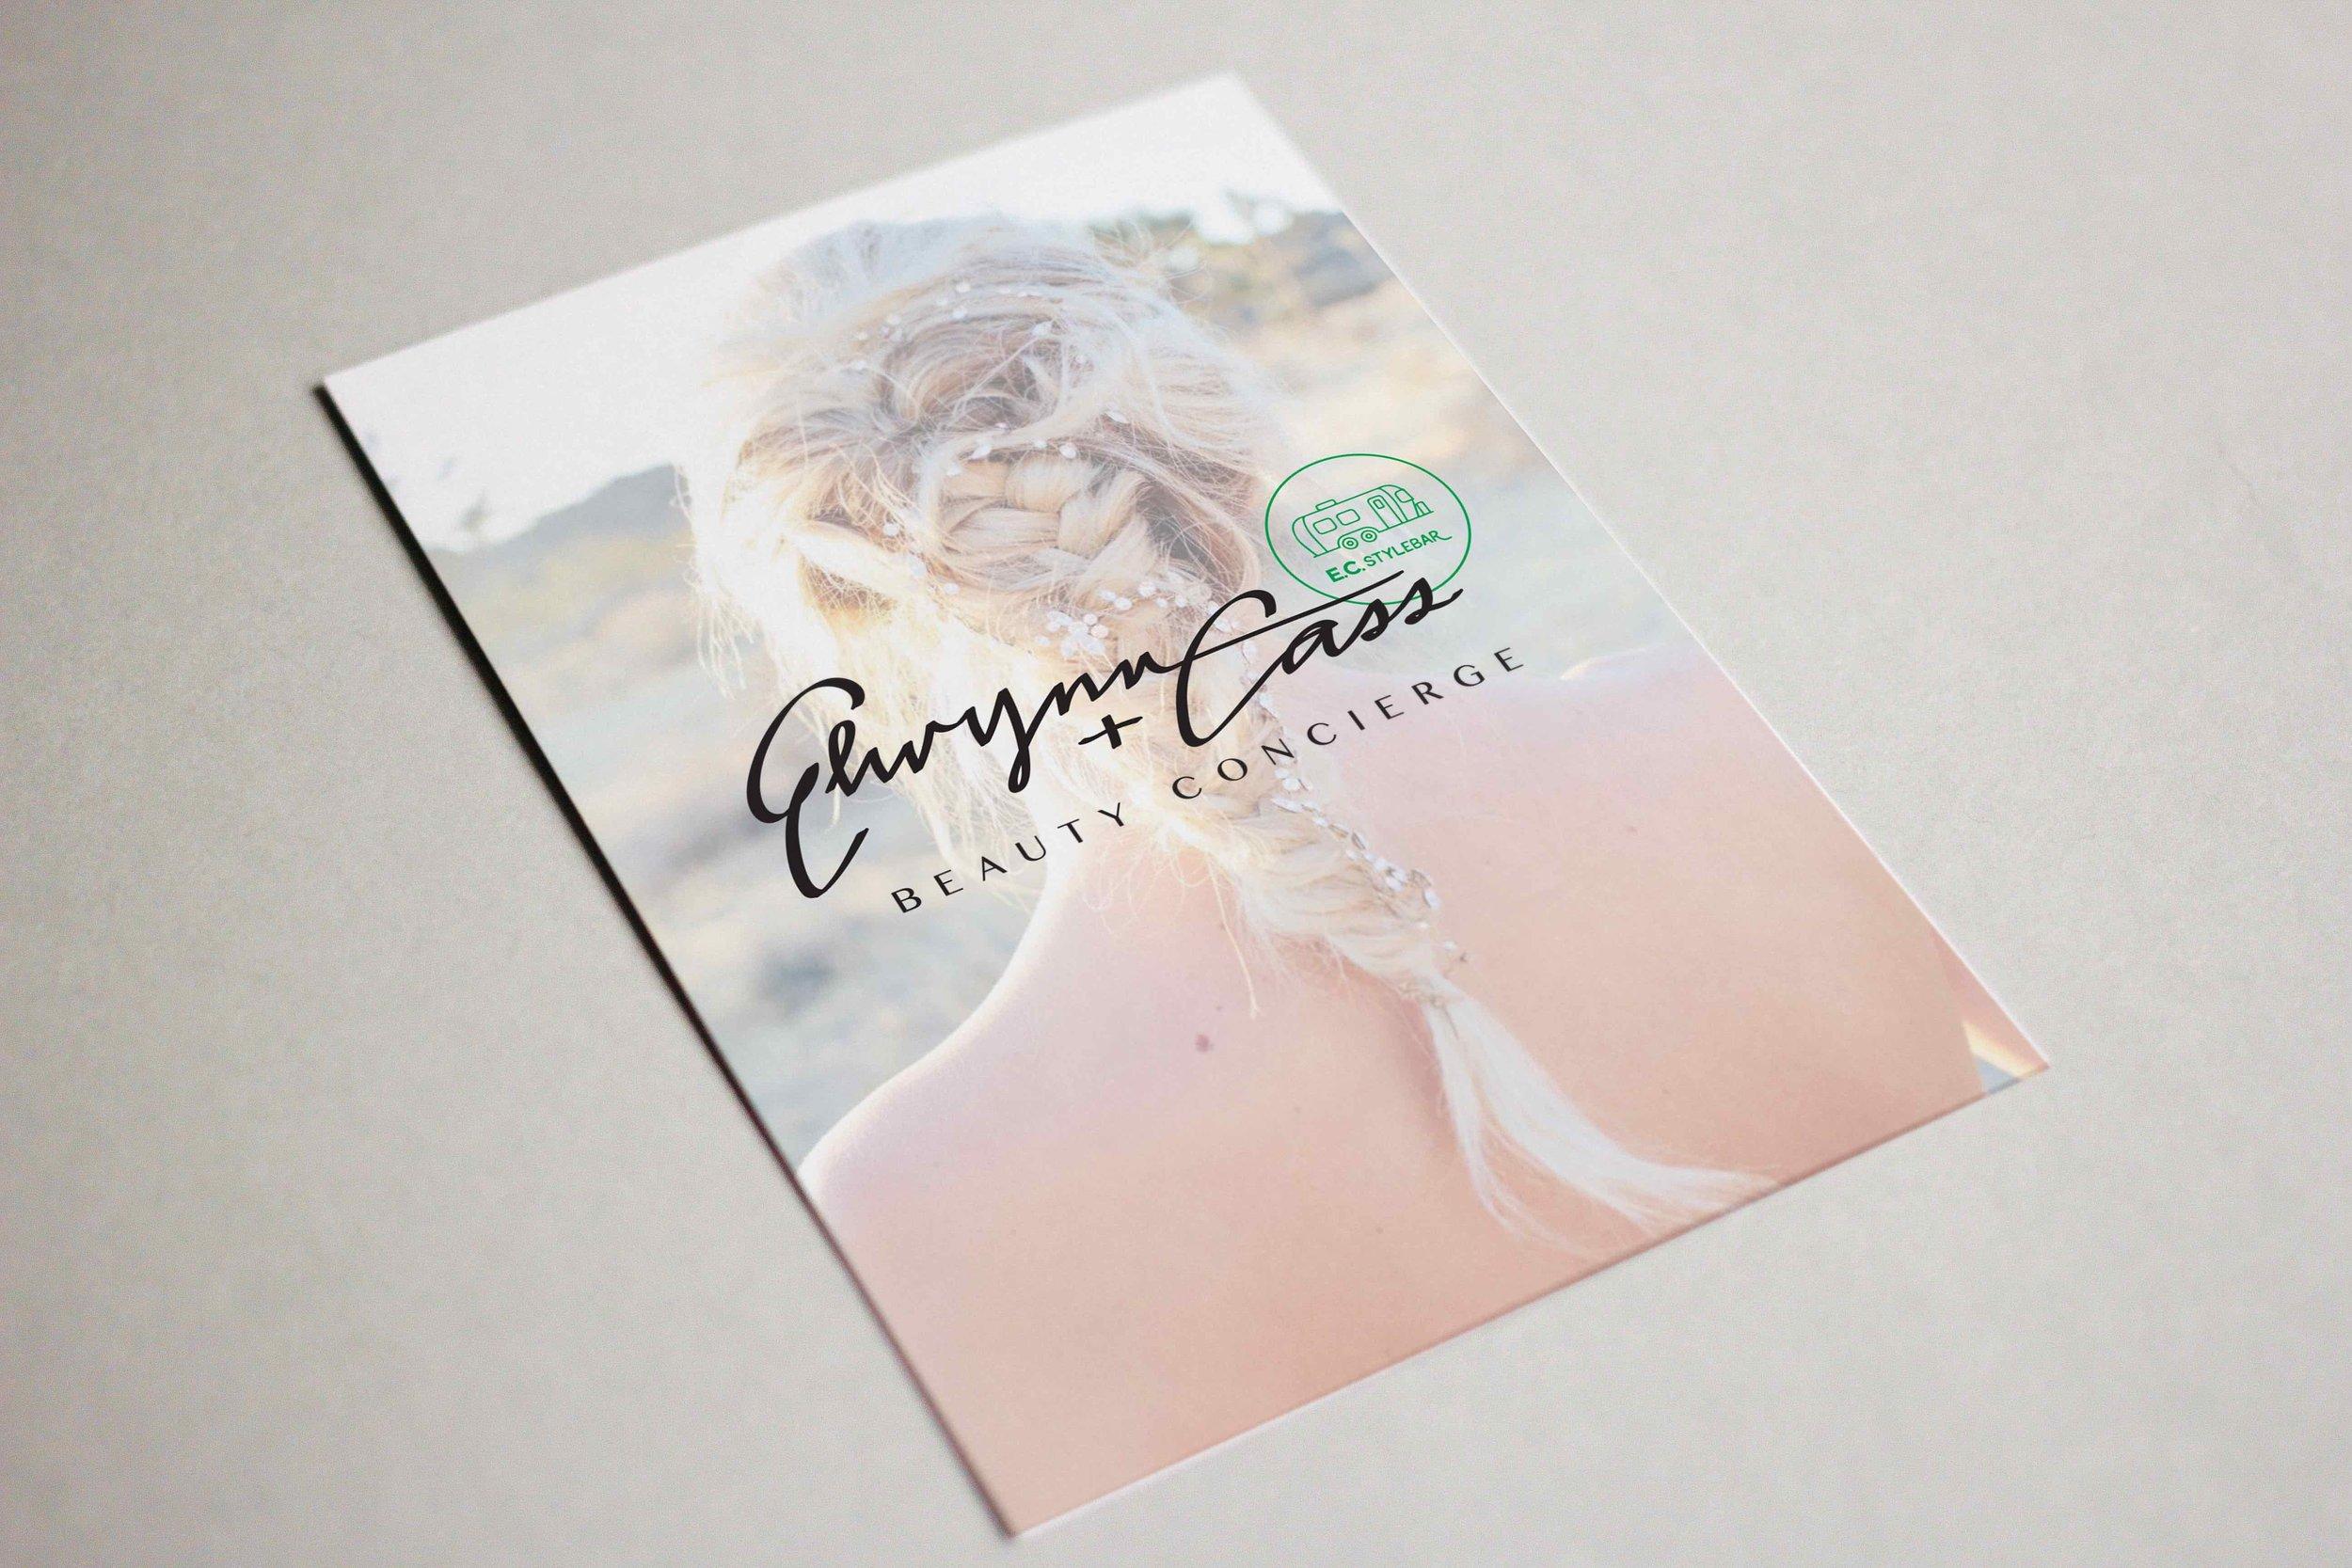 Elywnn + Cass Media Kit Design